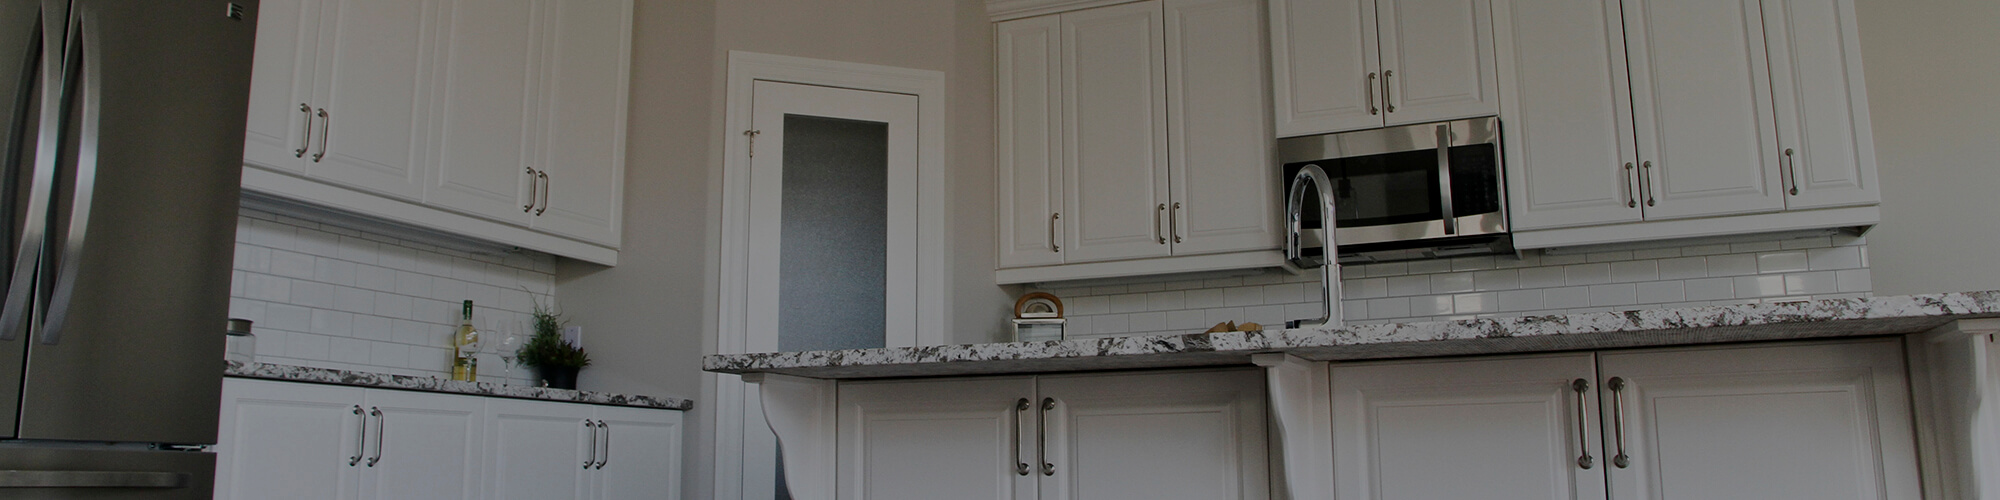 About Us Cataraqui Cabinets